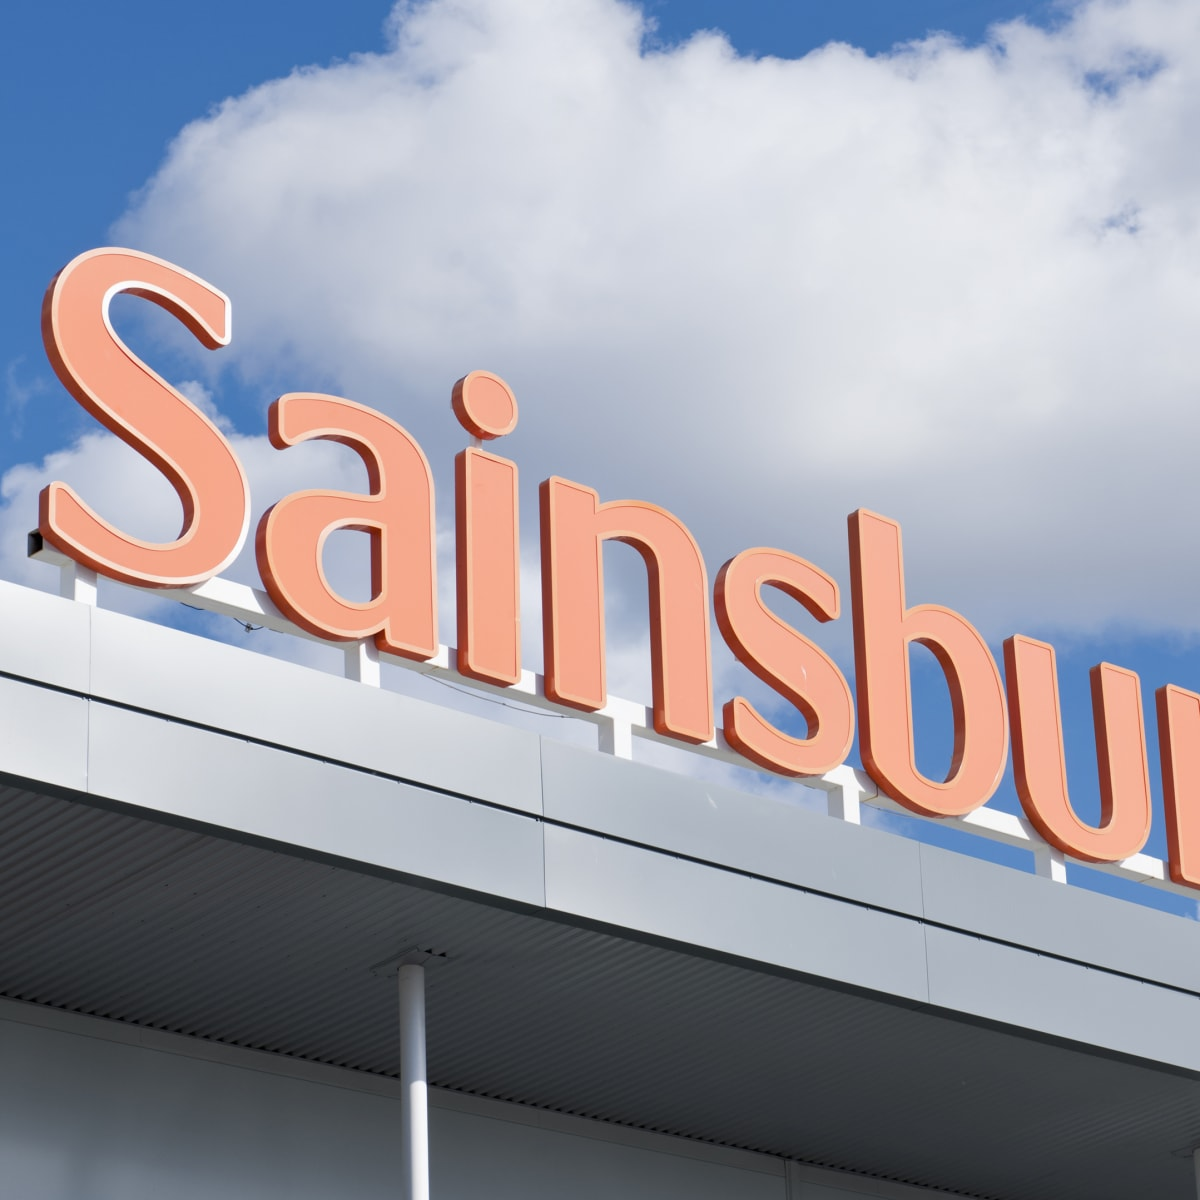 WTC UK WORK Sainsburys 3840x2160px